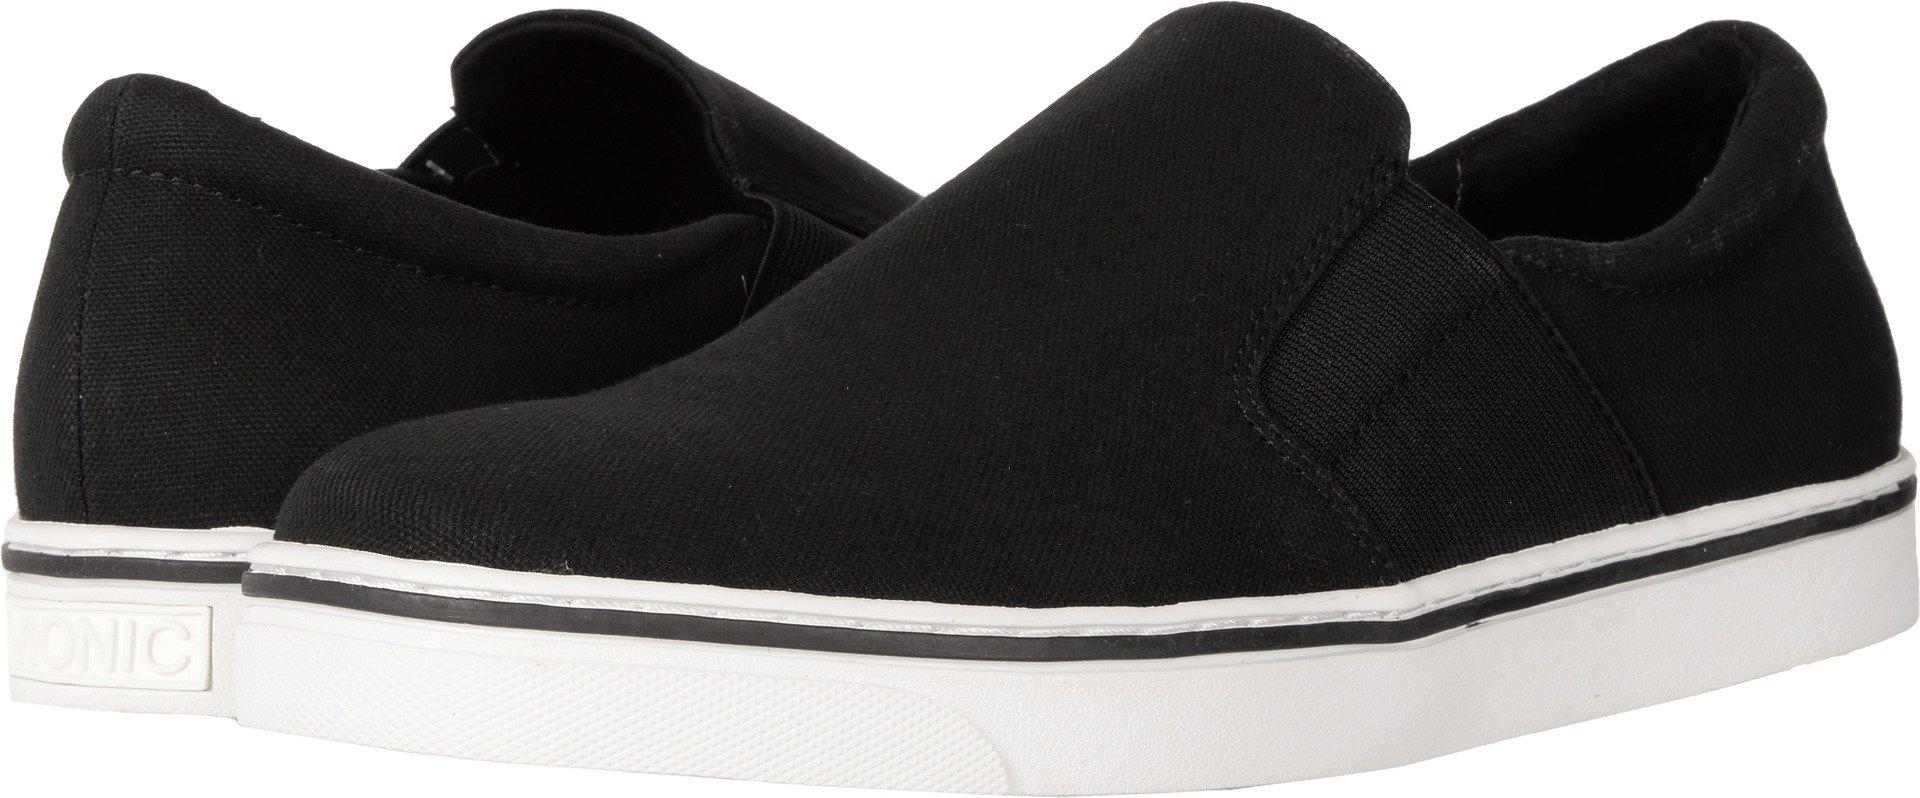 Vionic Men's Maddox Black Canvas Loafer